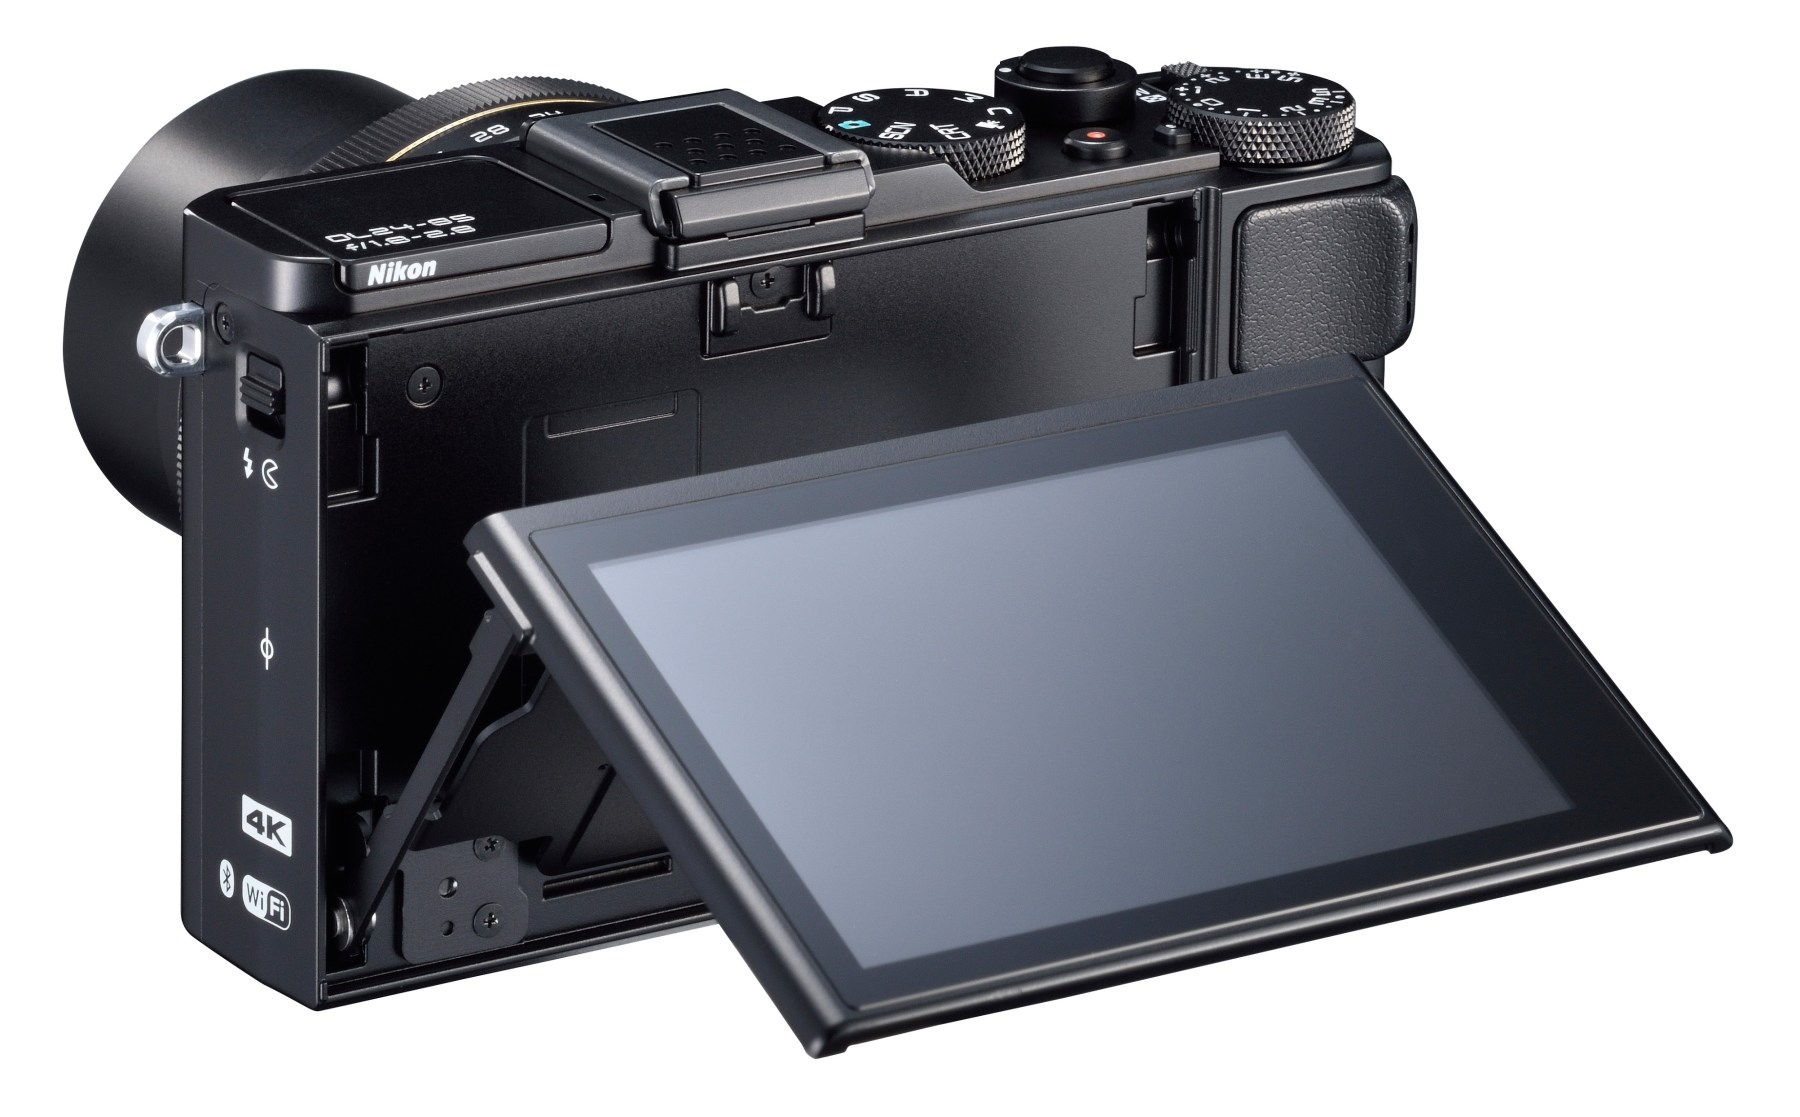 Nikon DL 24-85 camera